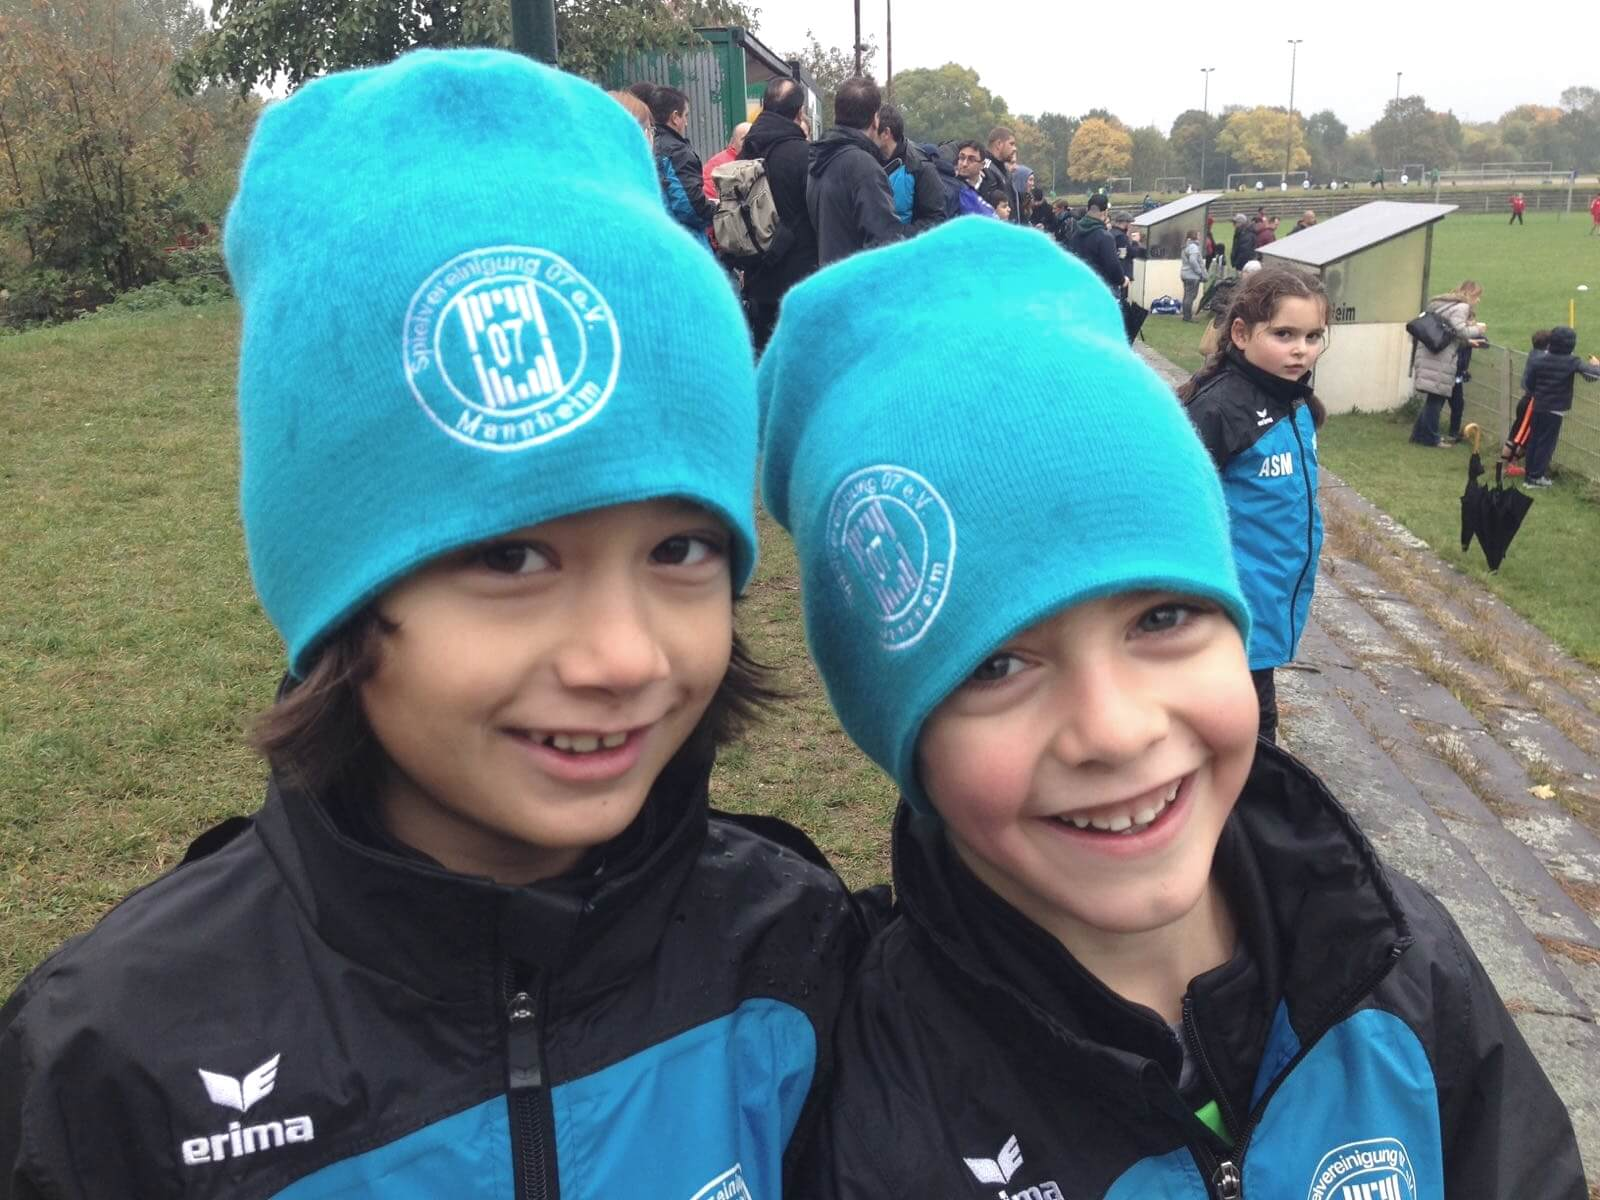 Warme Kinderköpfe im Mannheimer Herbst